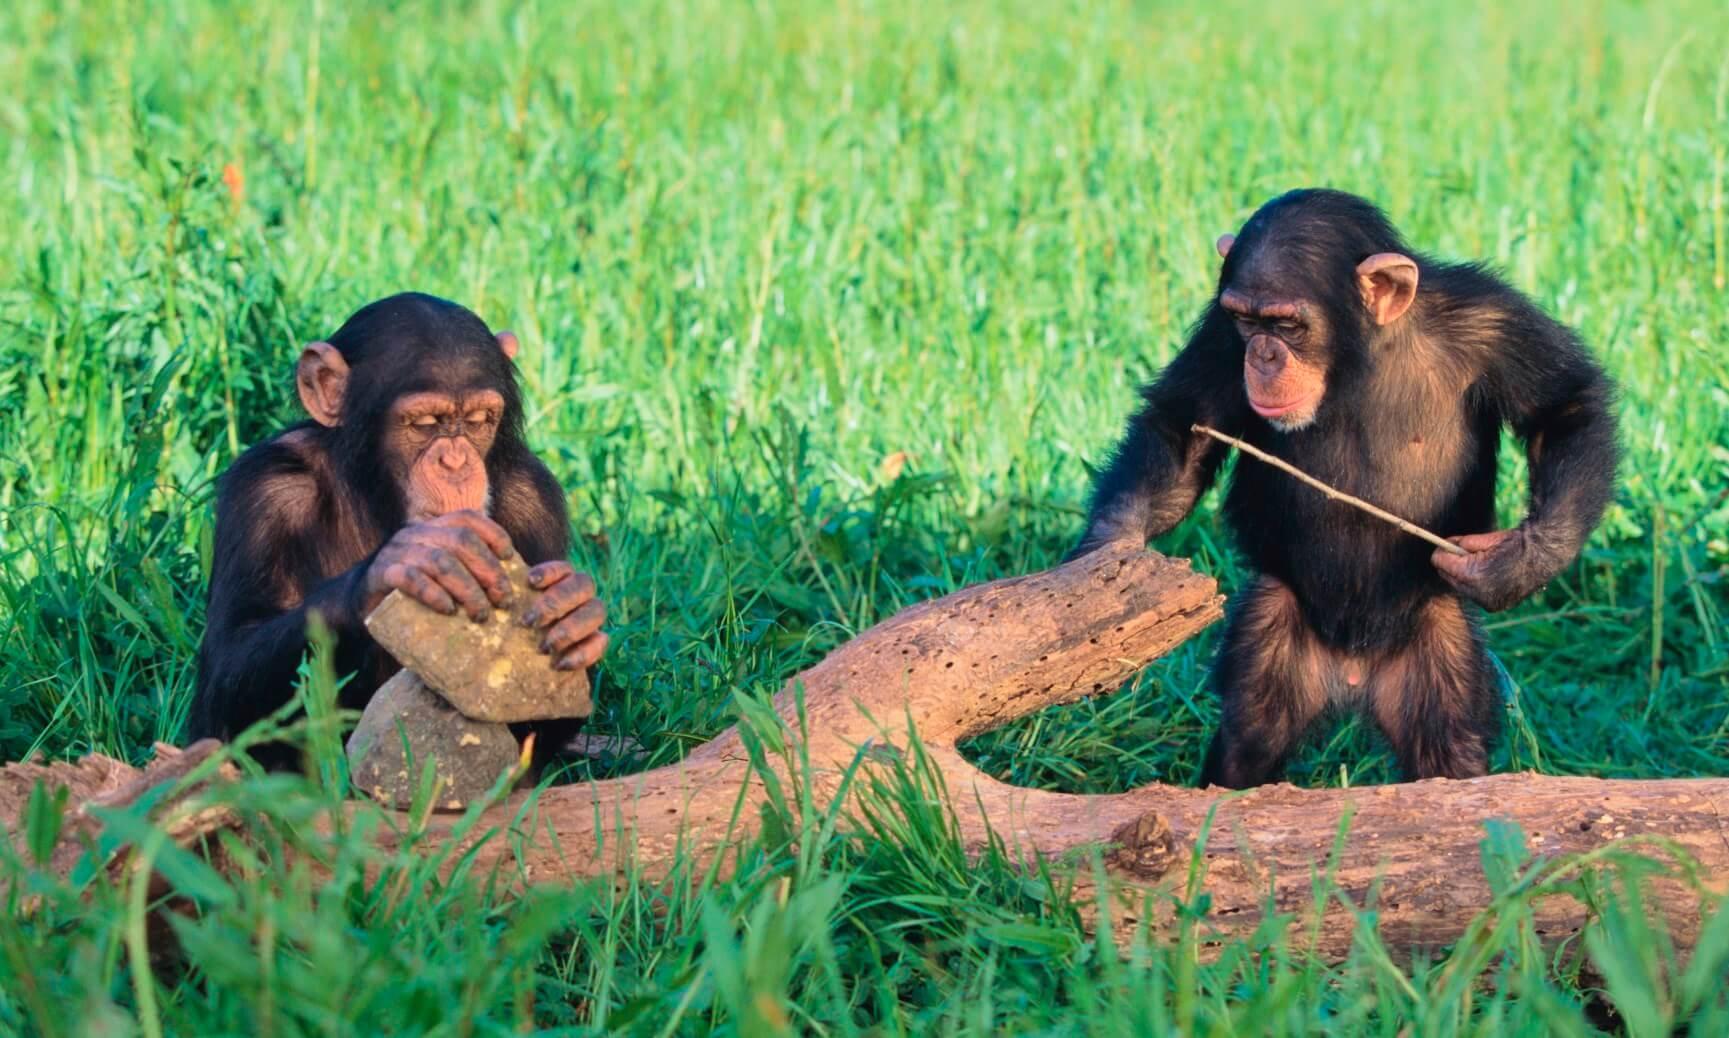 Chimpanzees using rocks and sticks